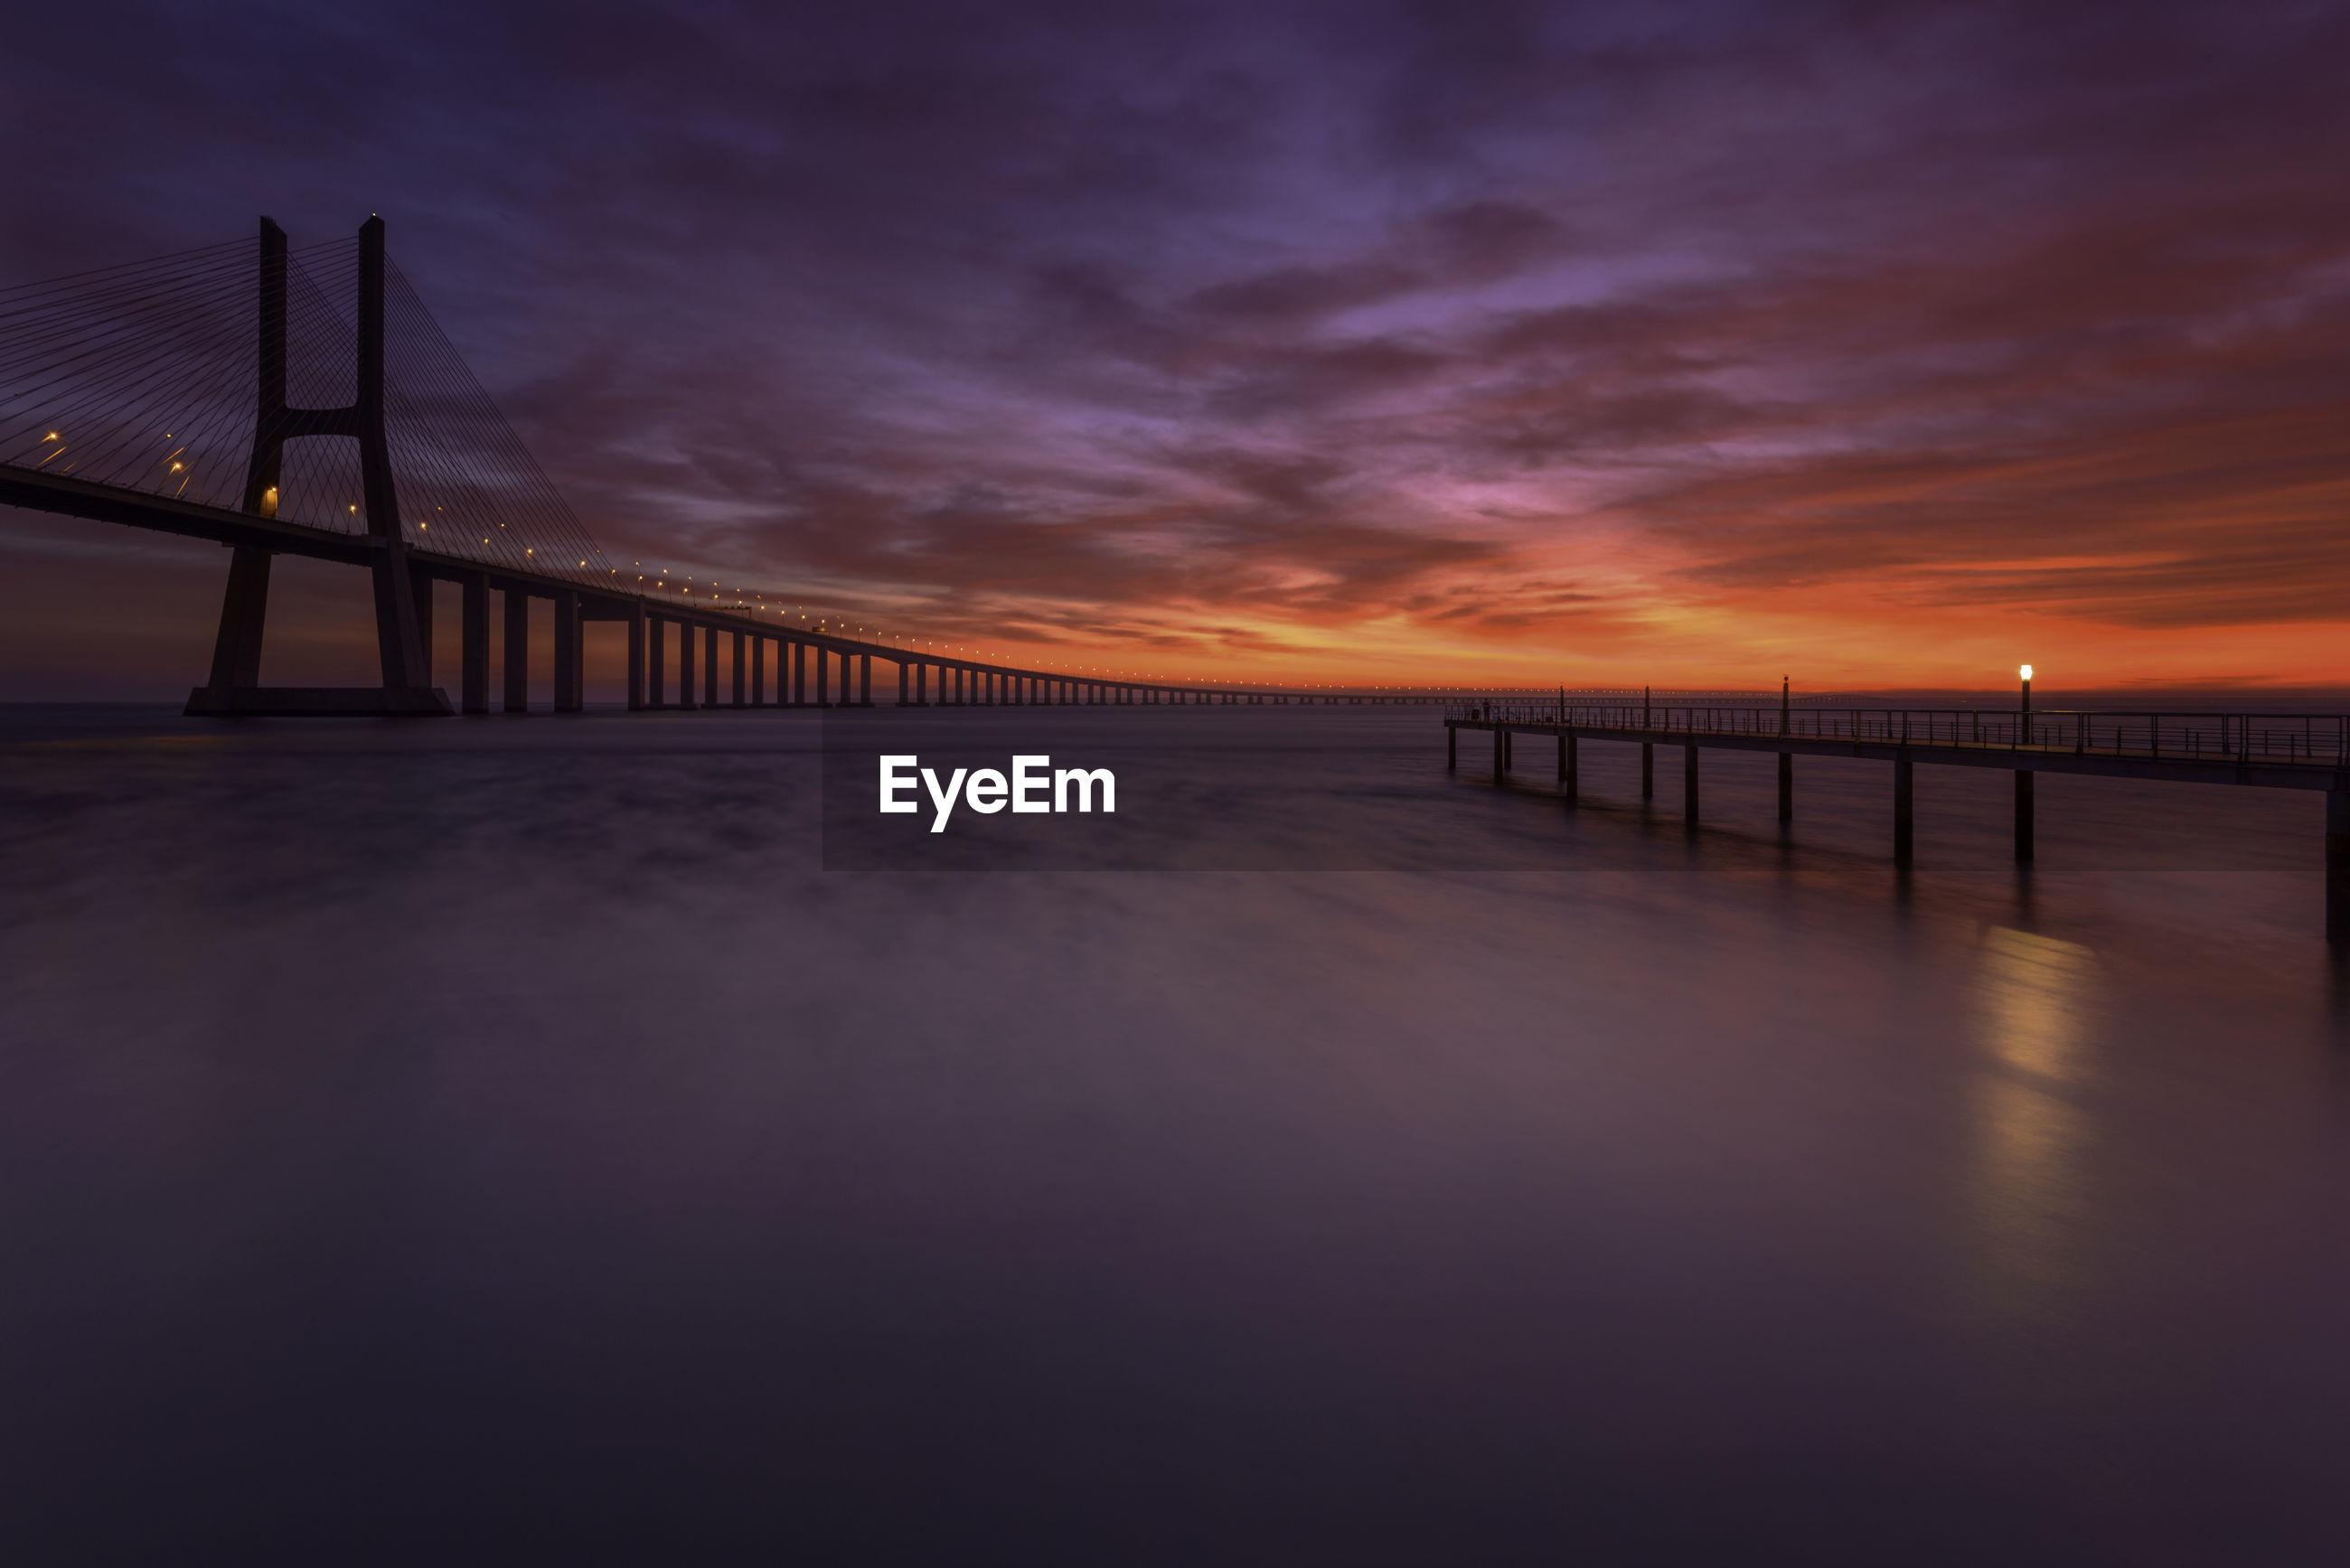 BRIDGE OVER CALM SEA AGAINST SUNSET SKY